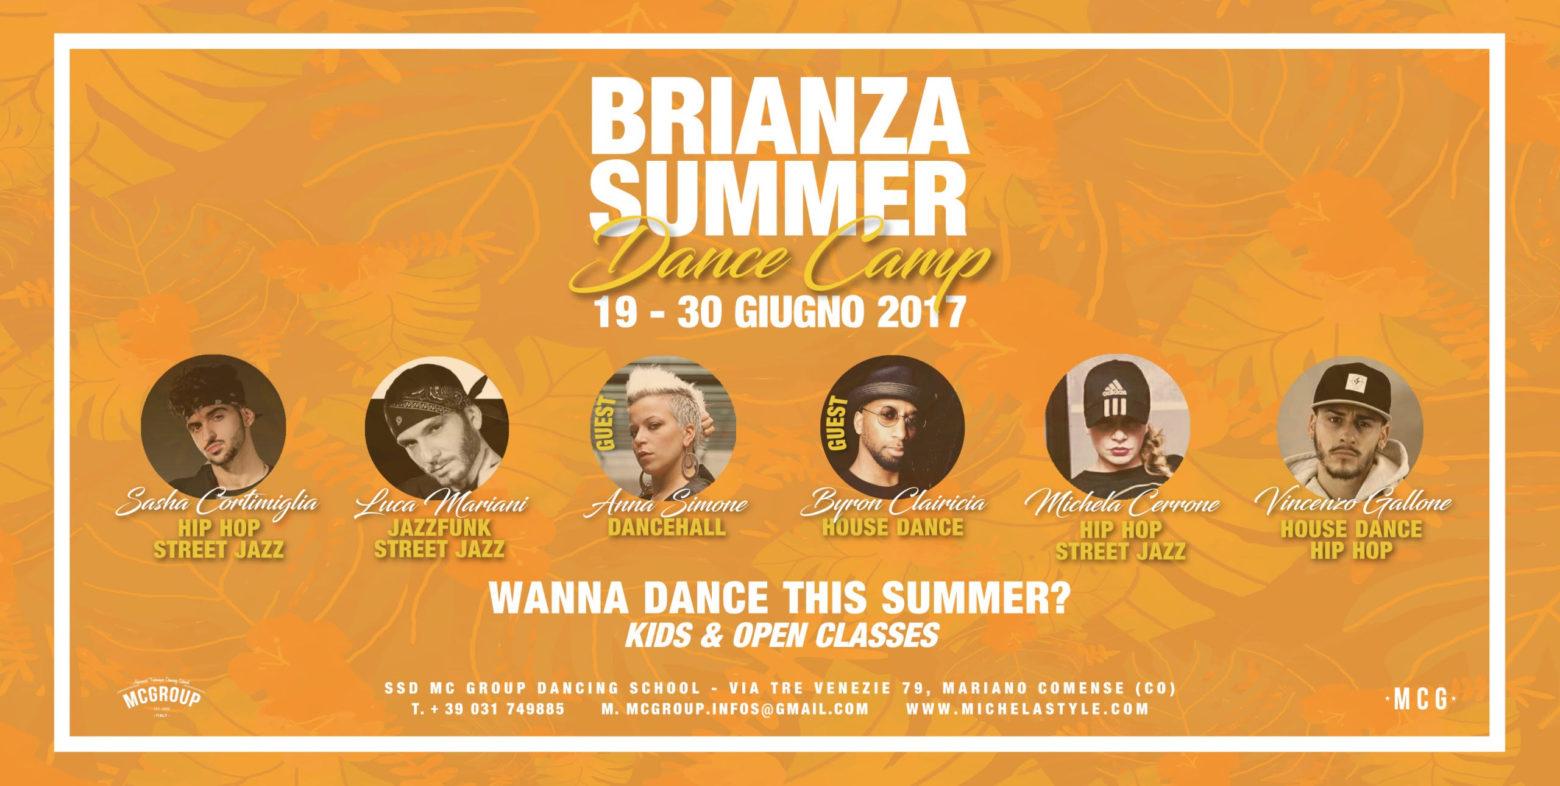 BRIANZA SUMMER DANCE CAMP 2017